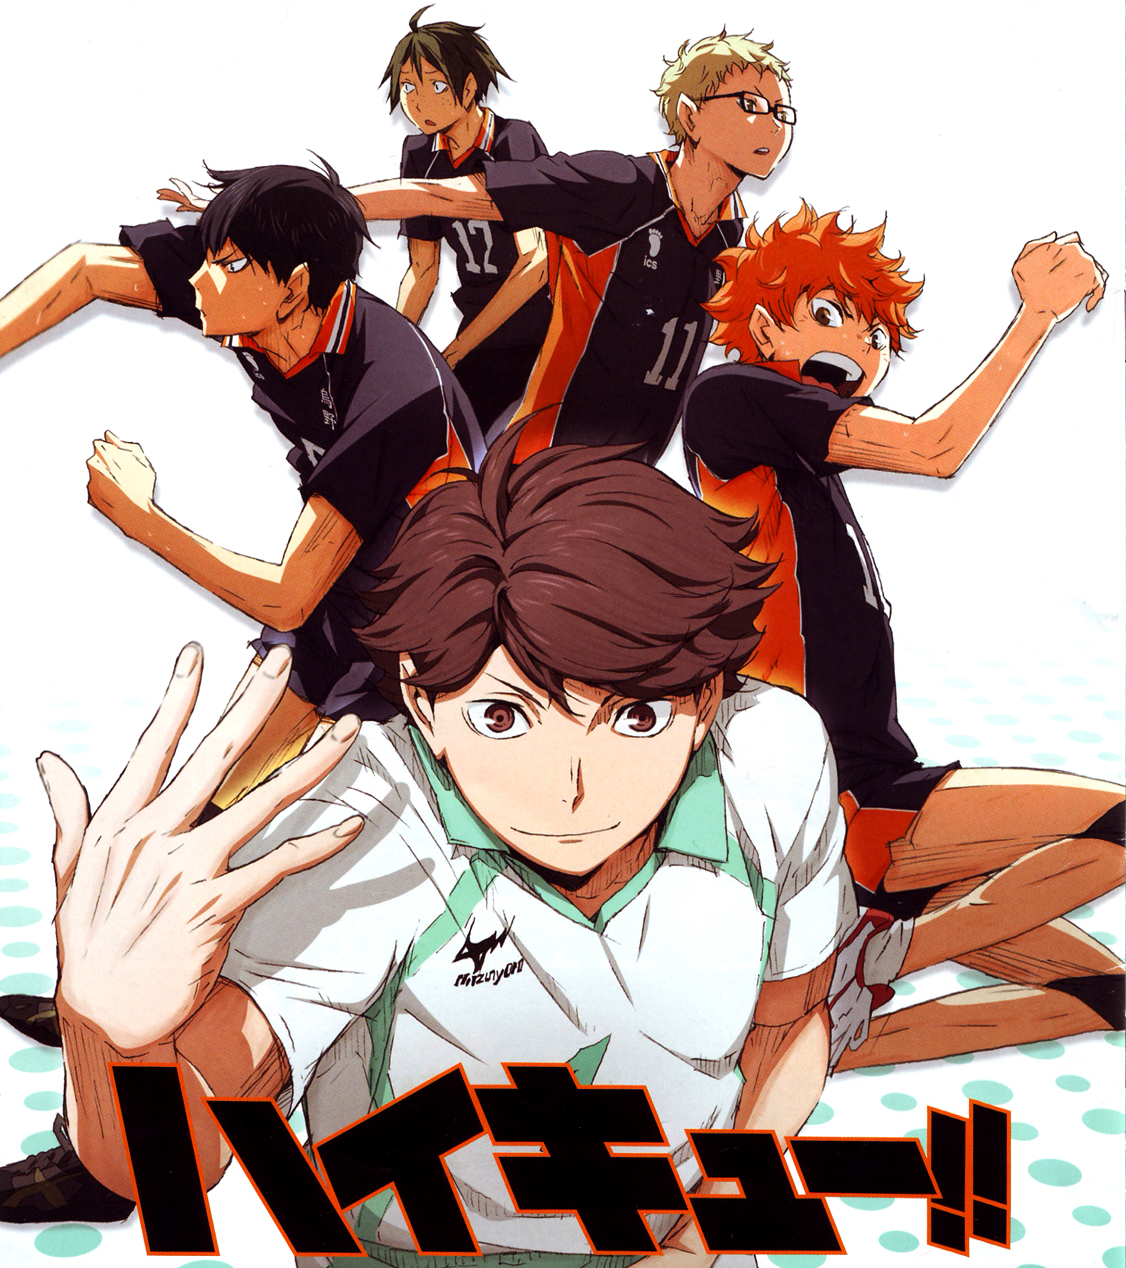 Anime 2014: Top Ten Favorite Animes 2014